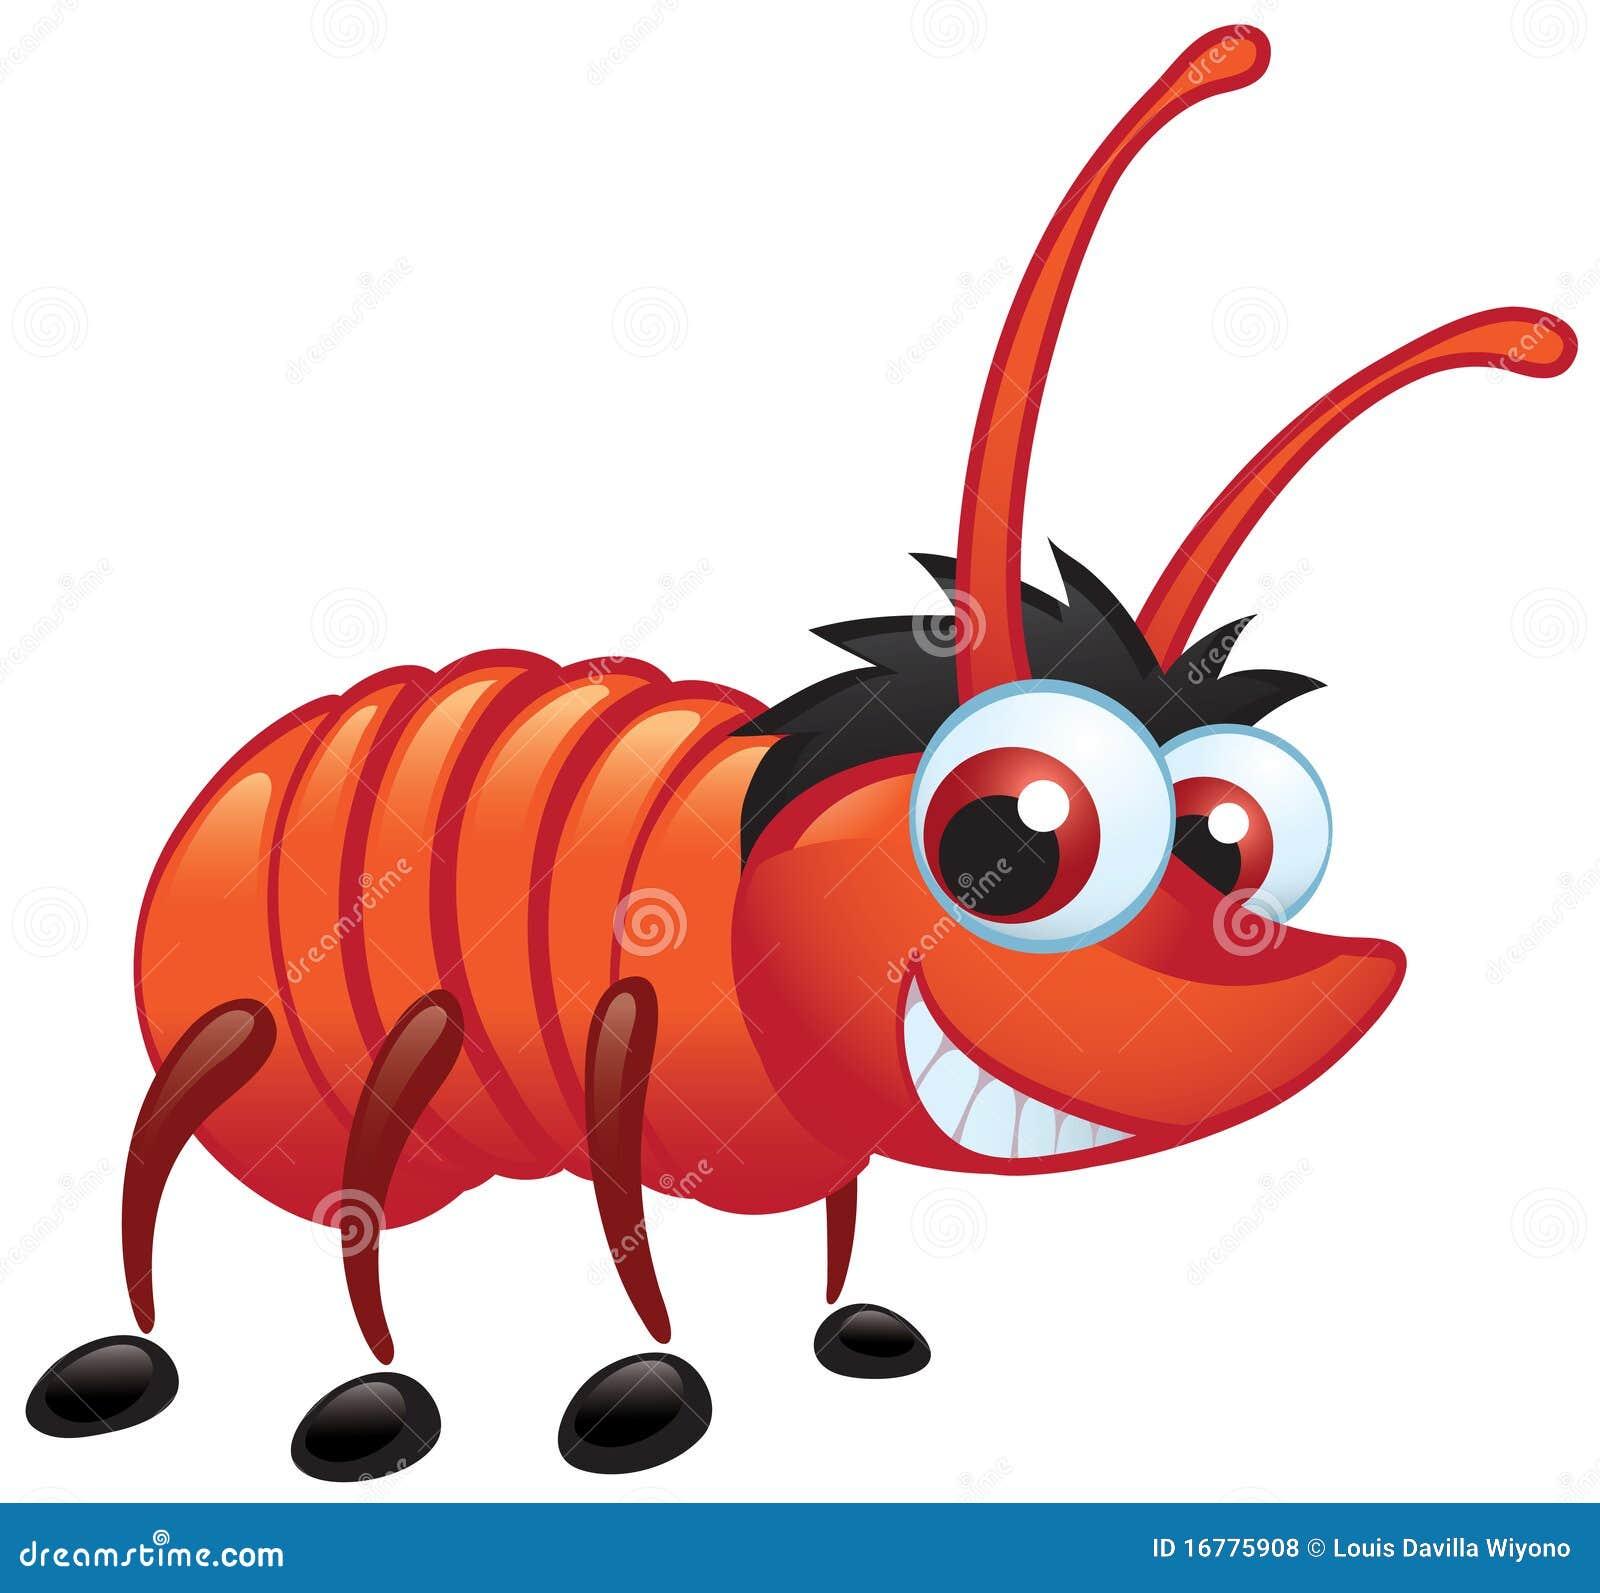 big bug royalty free stock photo image 36020595